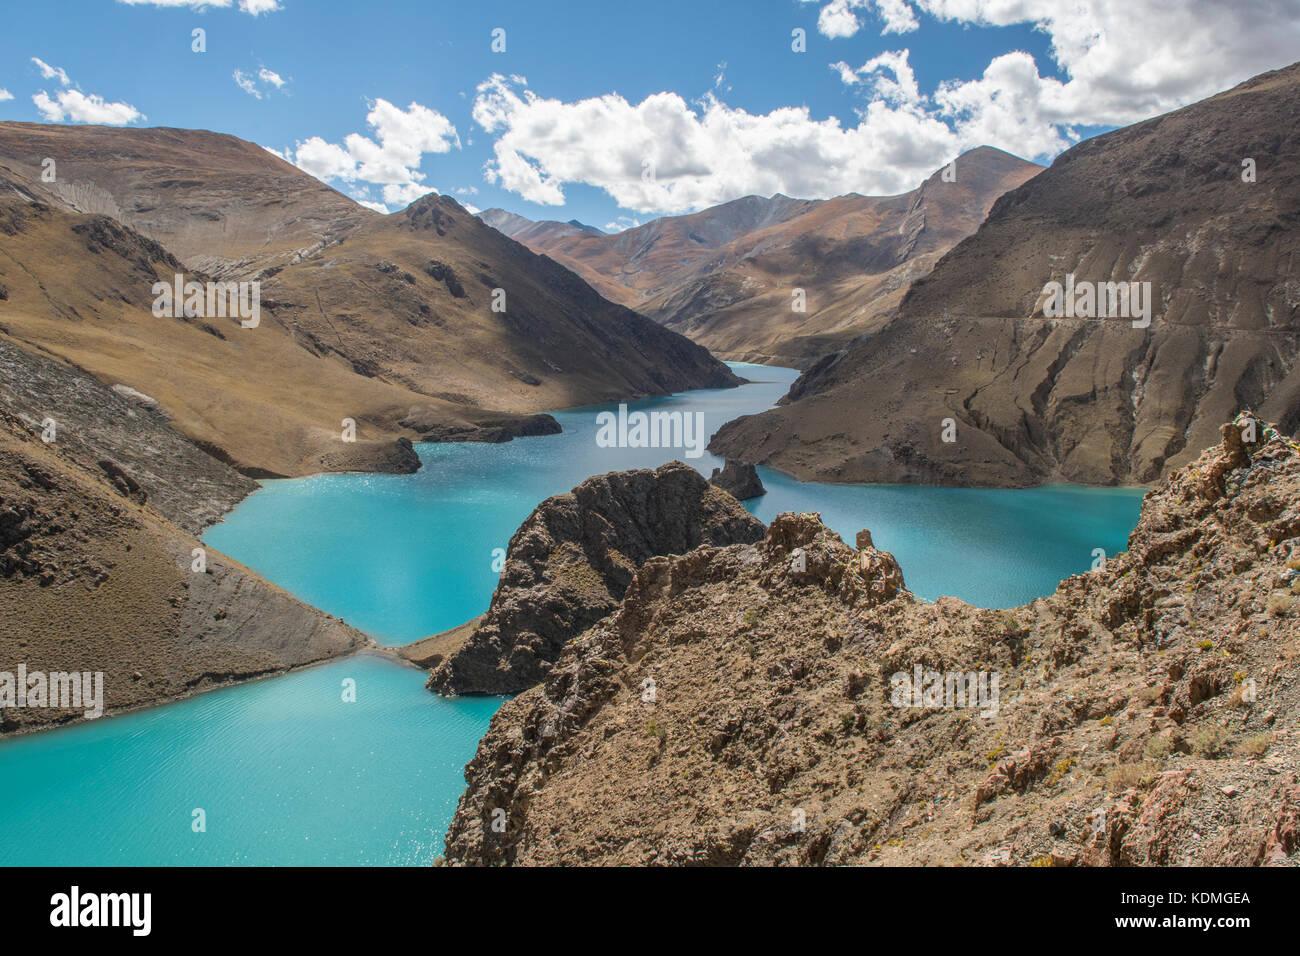 Yamdrok Lake, Shannan, Tibet, China - Stock Image